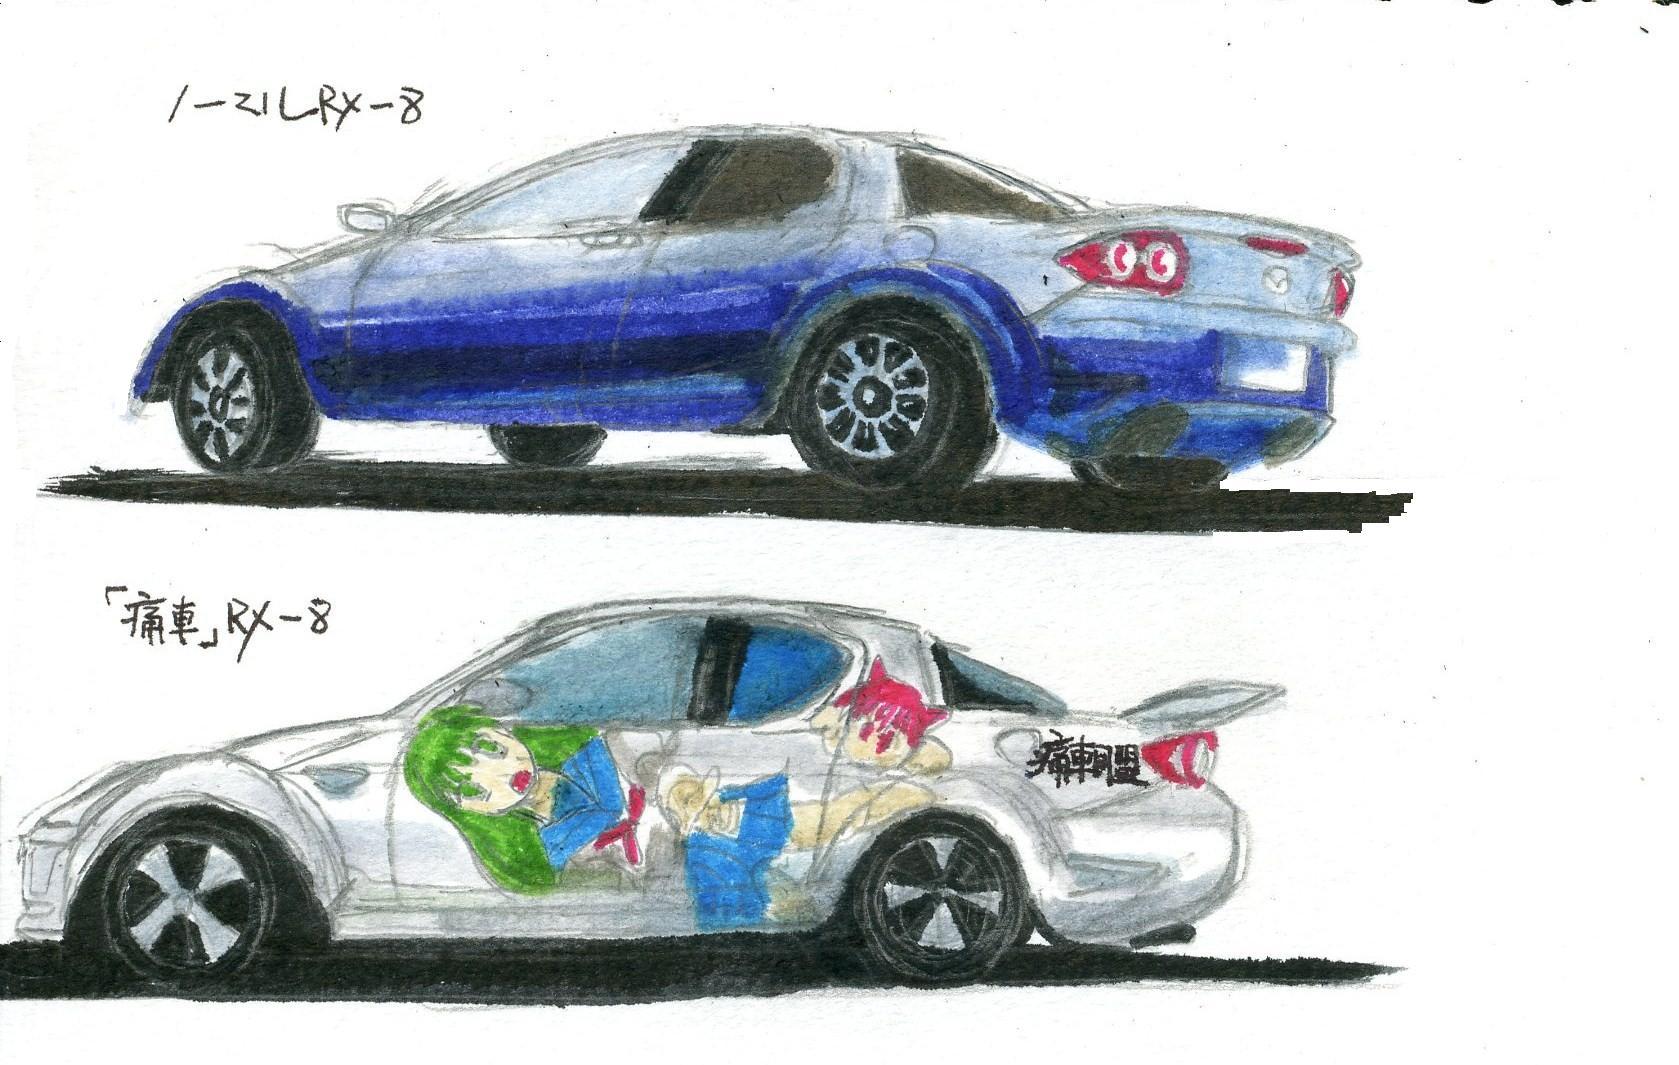 RX-8 ノーマル&痛車